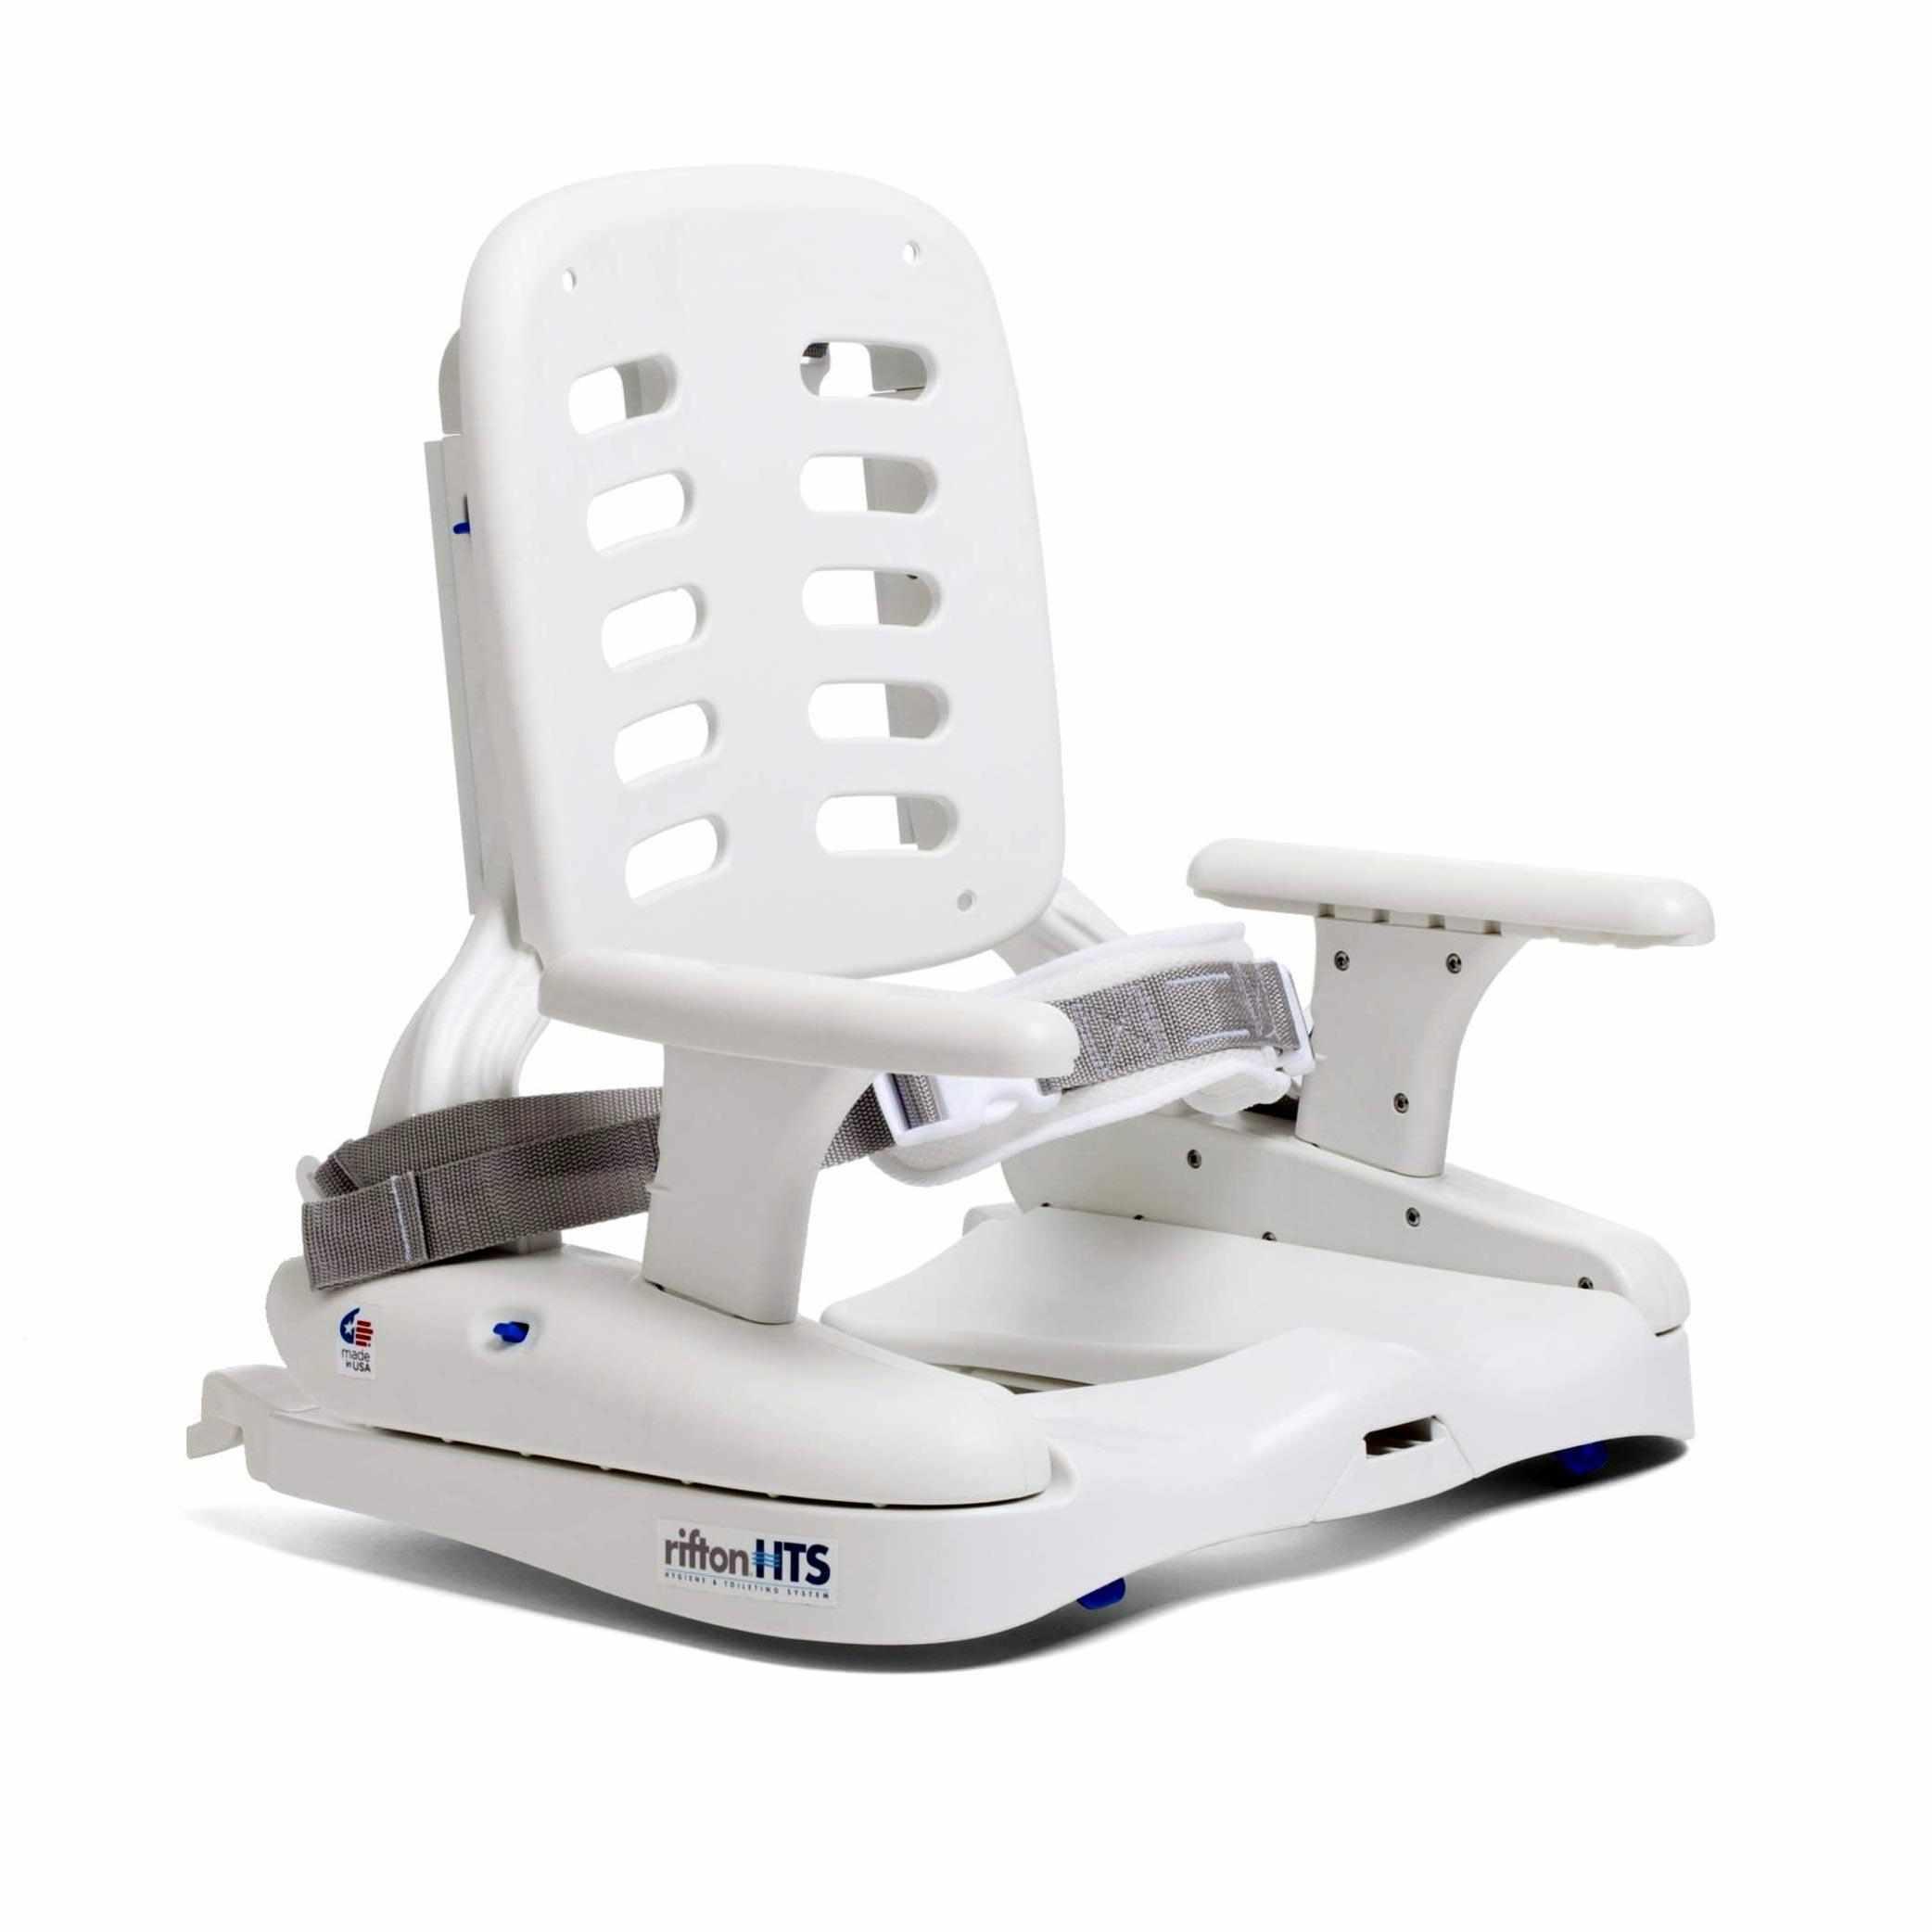 Rifton HTS hygiene toileting system